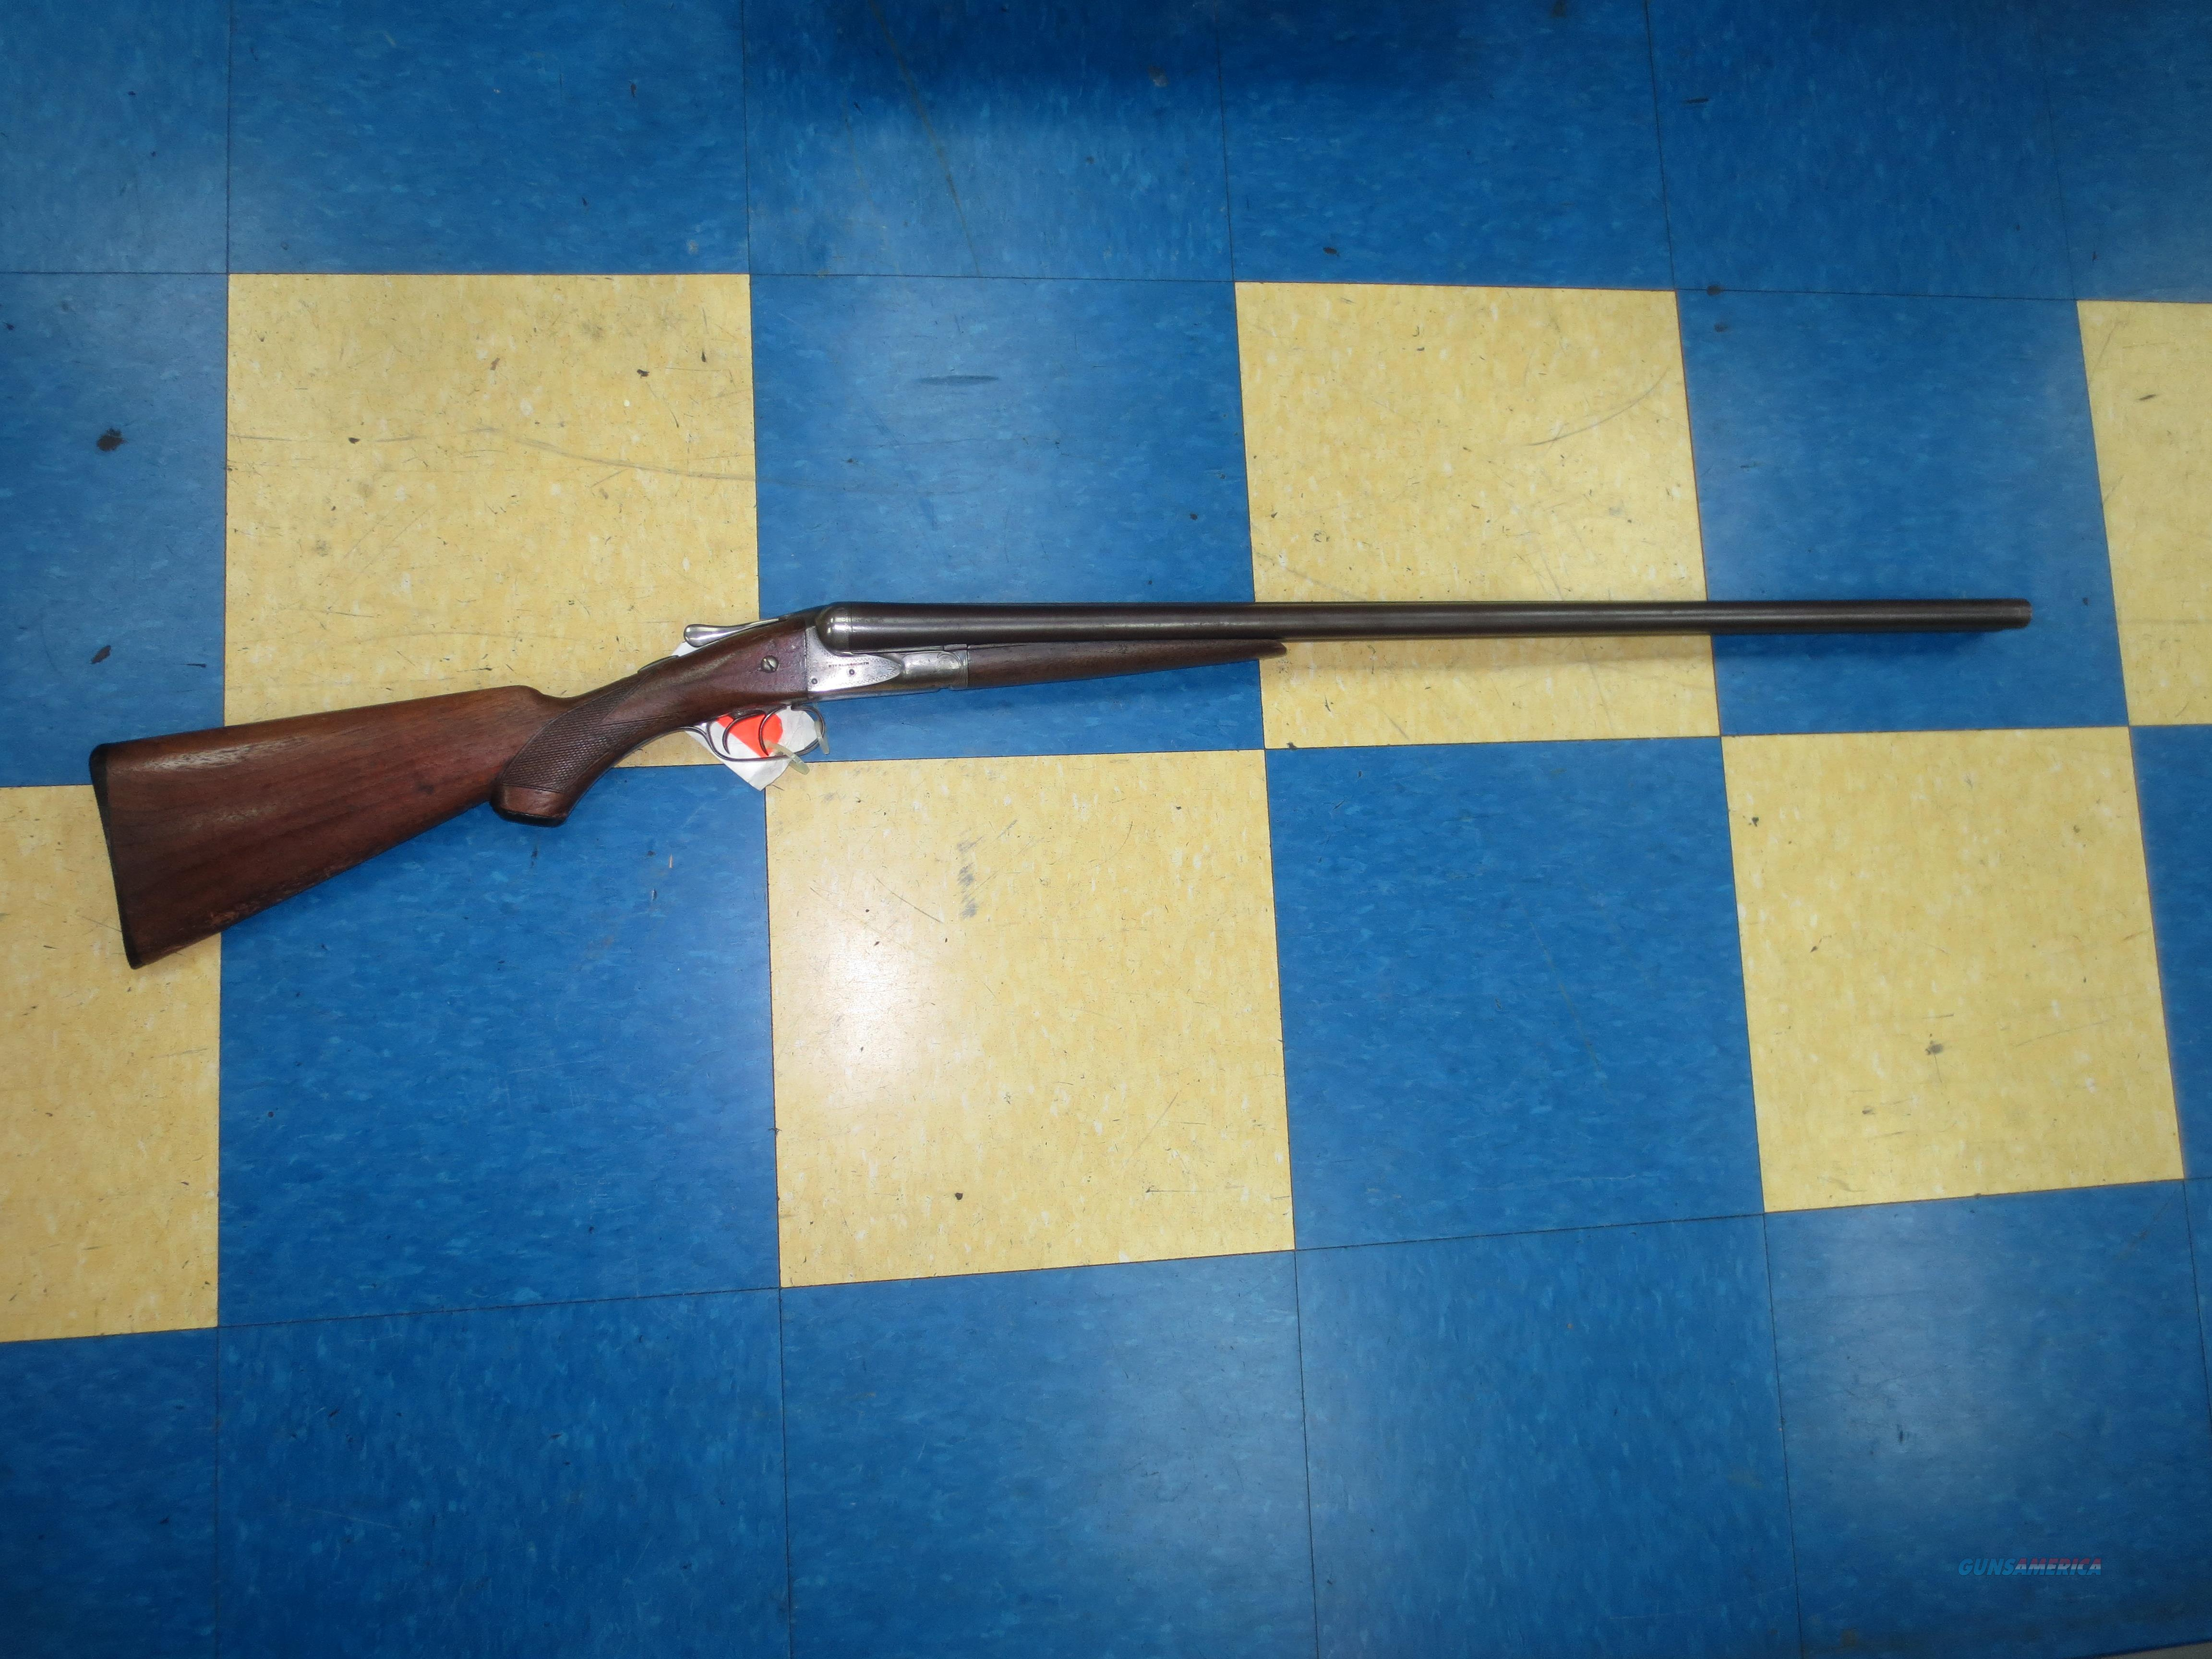 AW Fox Sterlingworth SxS 12 gauge shotgun  Guns > Shotguns > Fox Shotguns